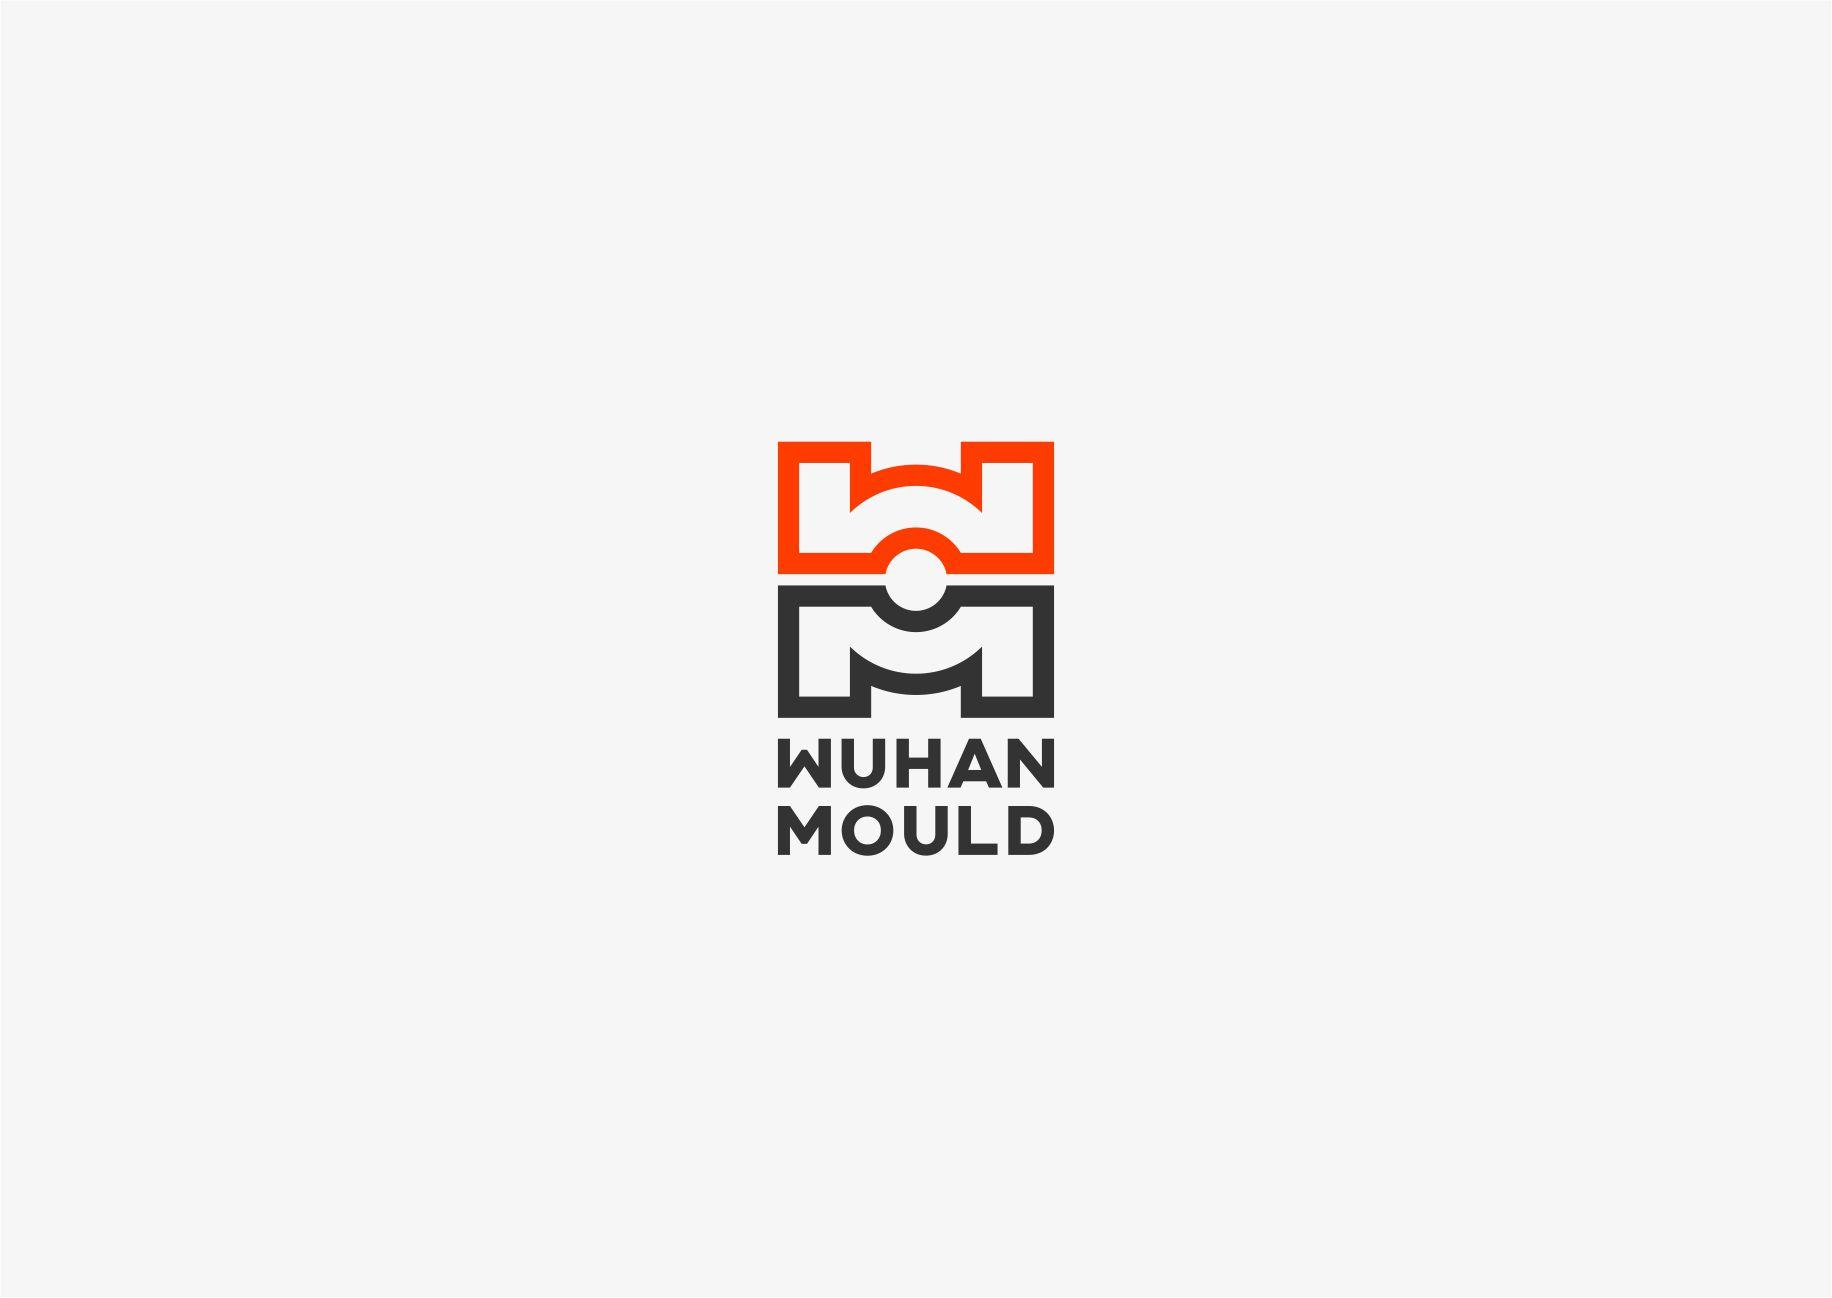 Создать логотип для фабрики пресс-форм фото f_039598b452ecc309.jpg